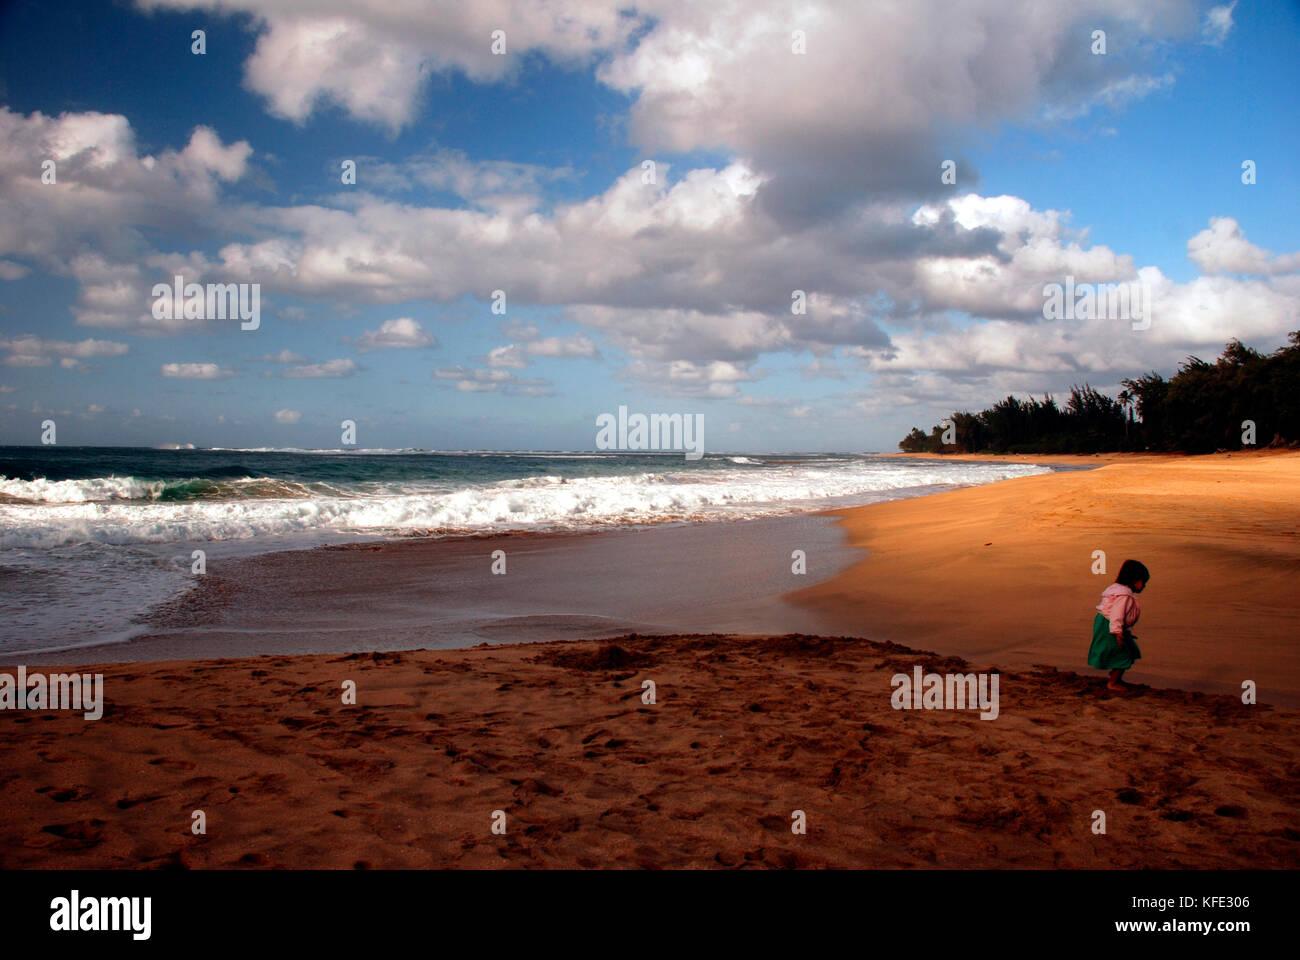 Young girl explores Haena Beach on the island of Kauai, Hawaii - Stock Image